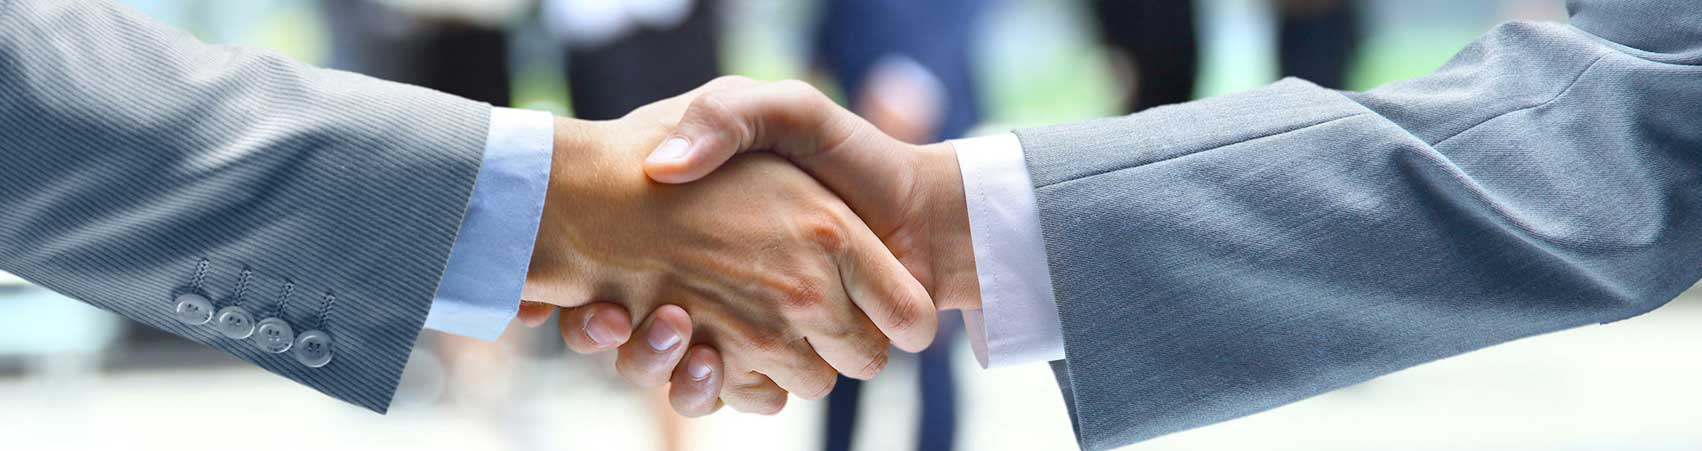 Plan 4 Profit Partnership